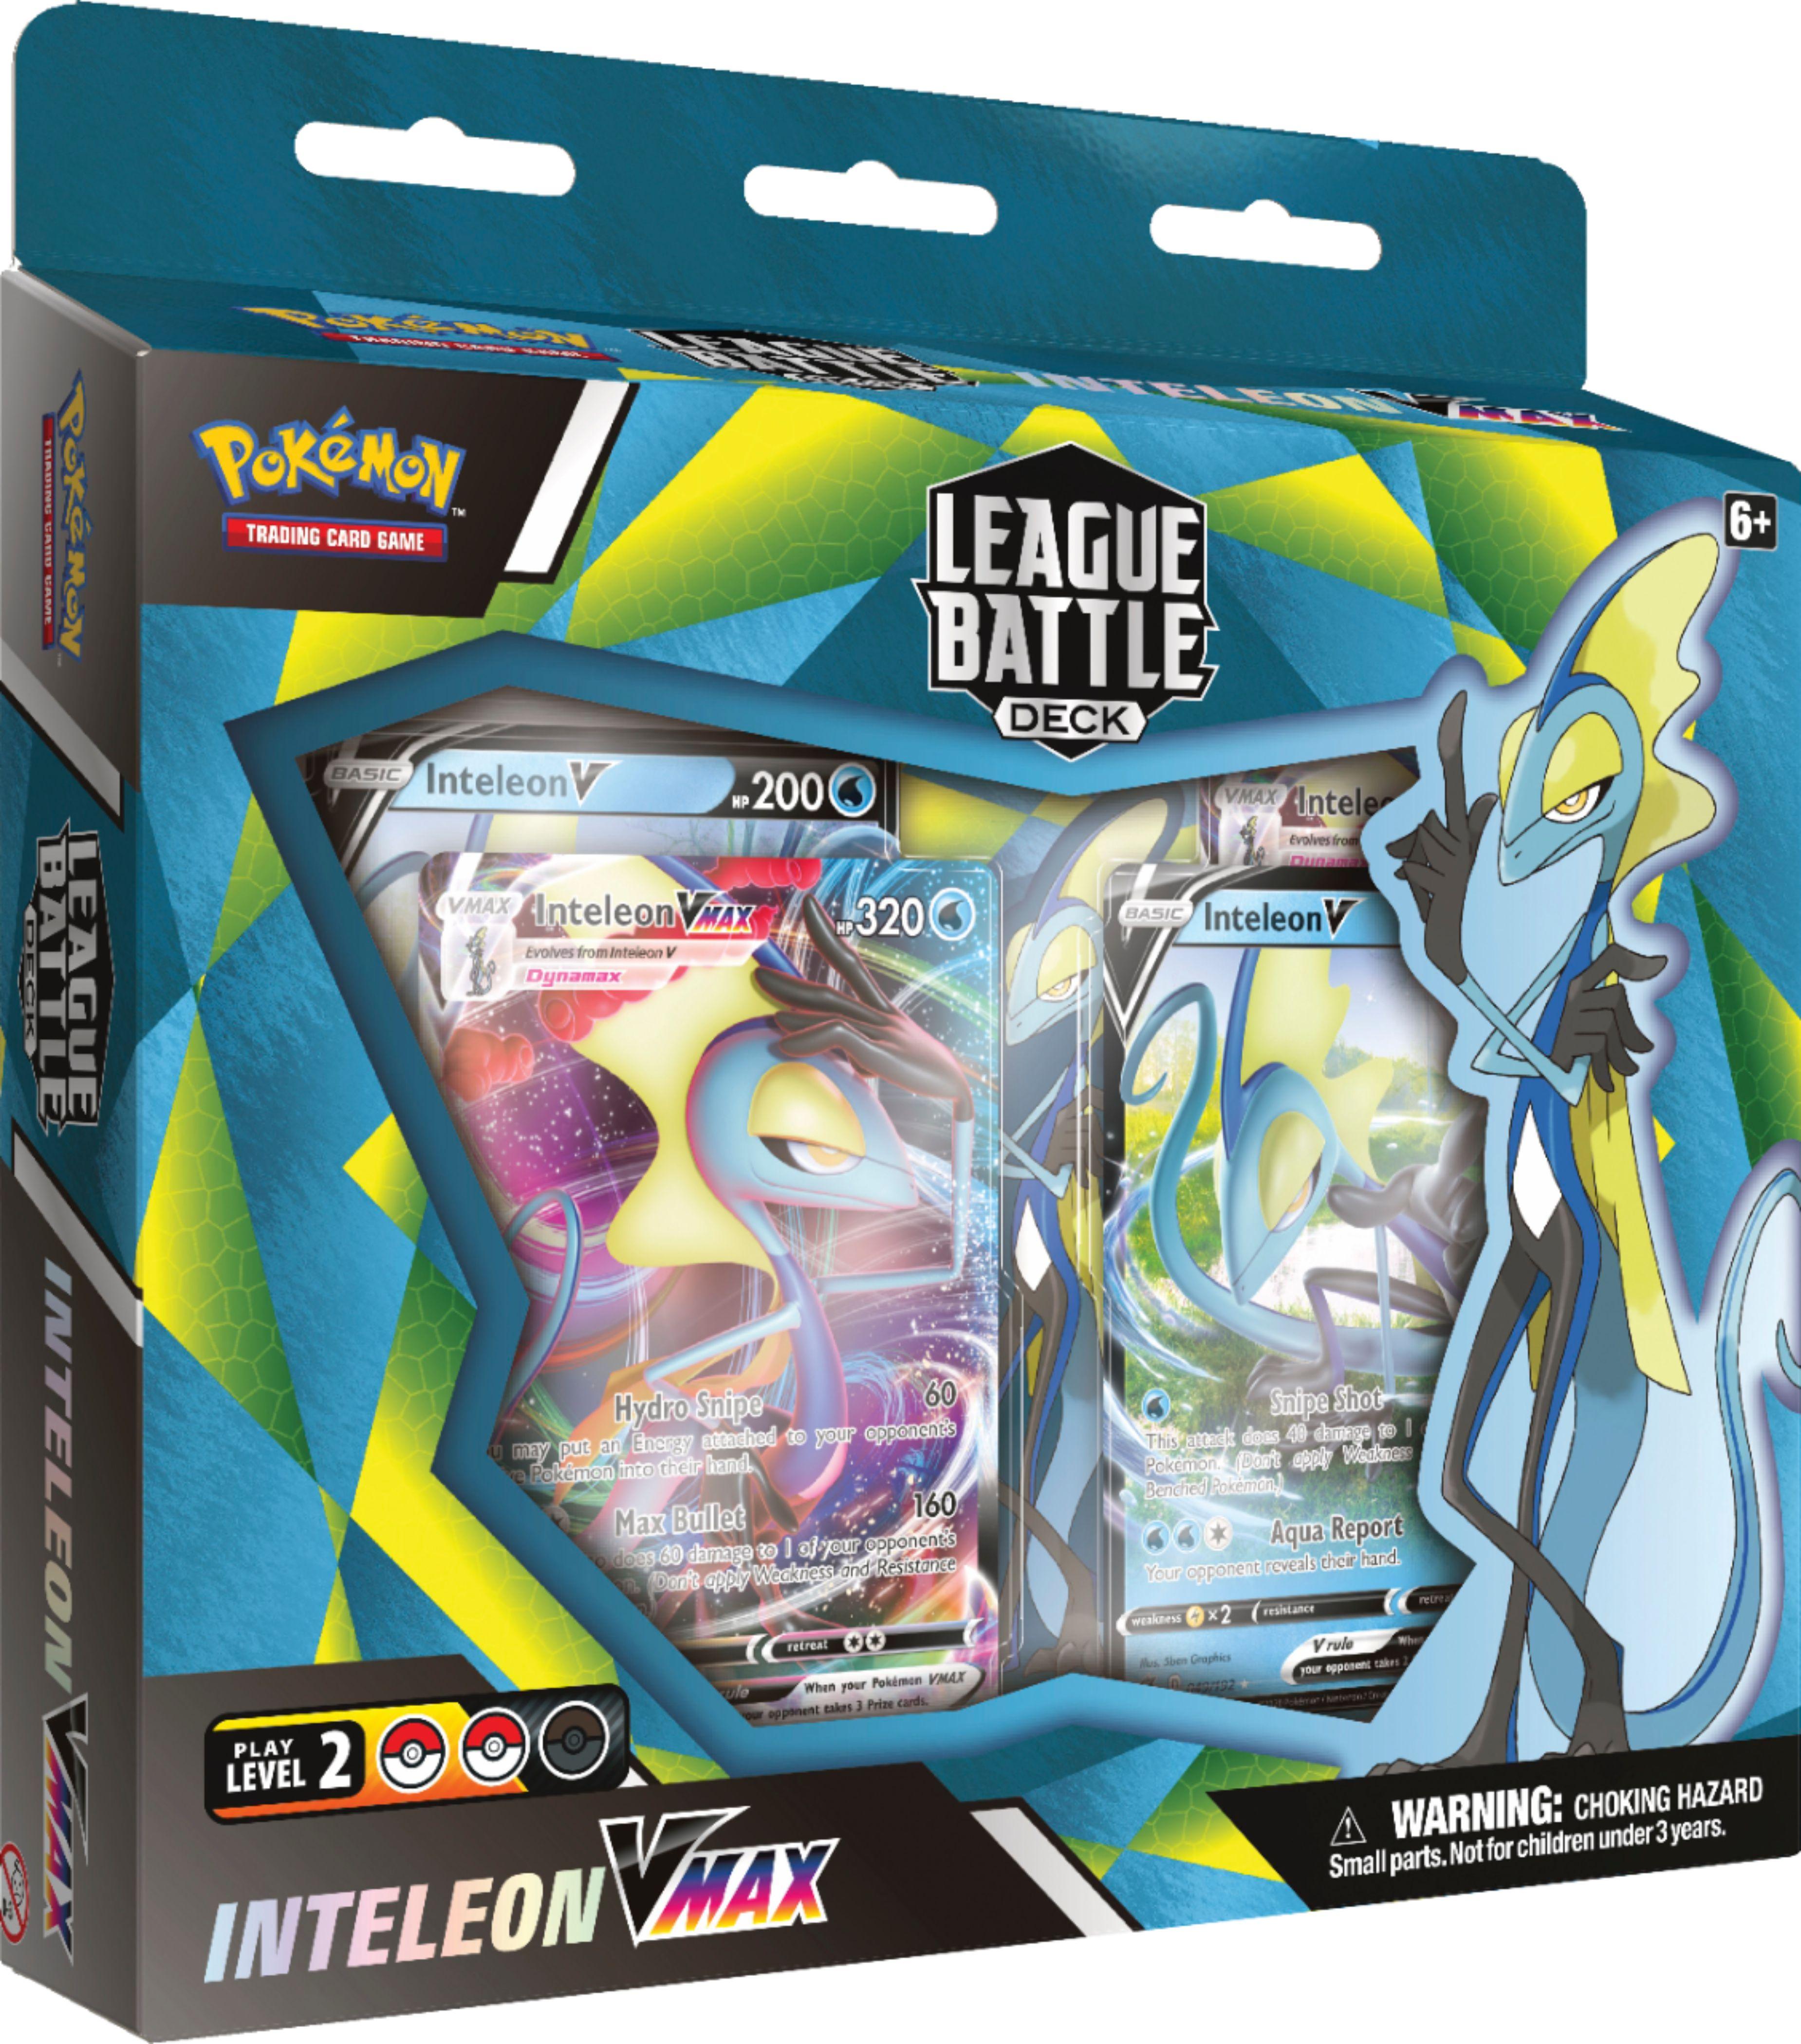 Pokémon Pokemon TCG: Inteleon VMAX Battle Deck 82874 - Best Buy $29.99